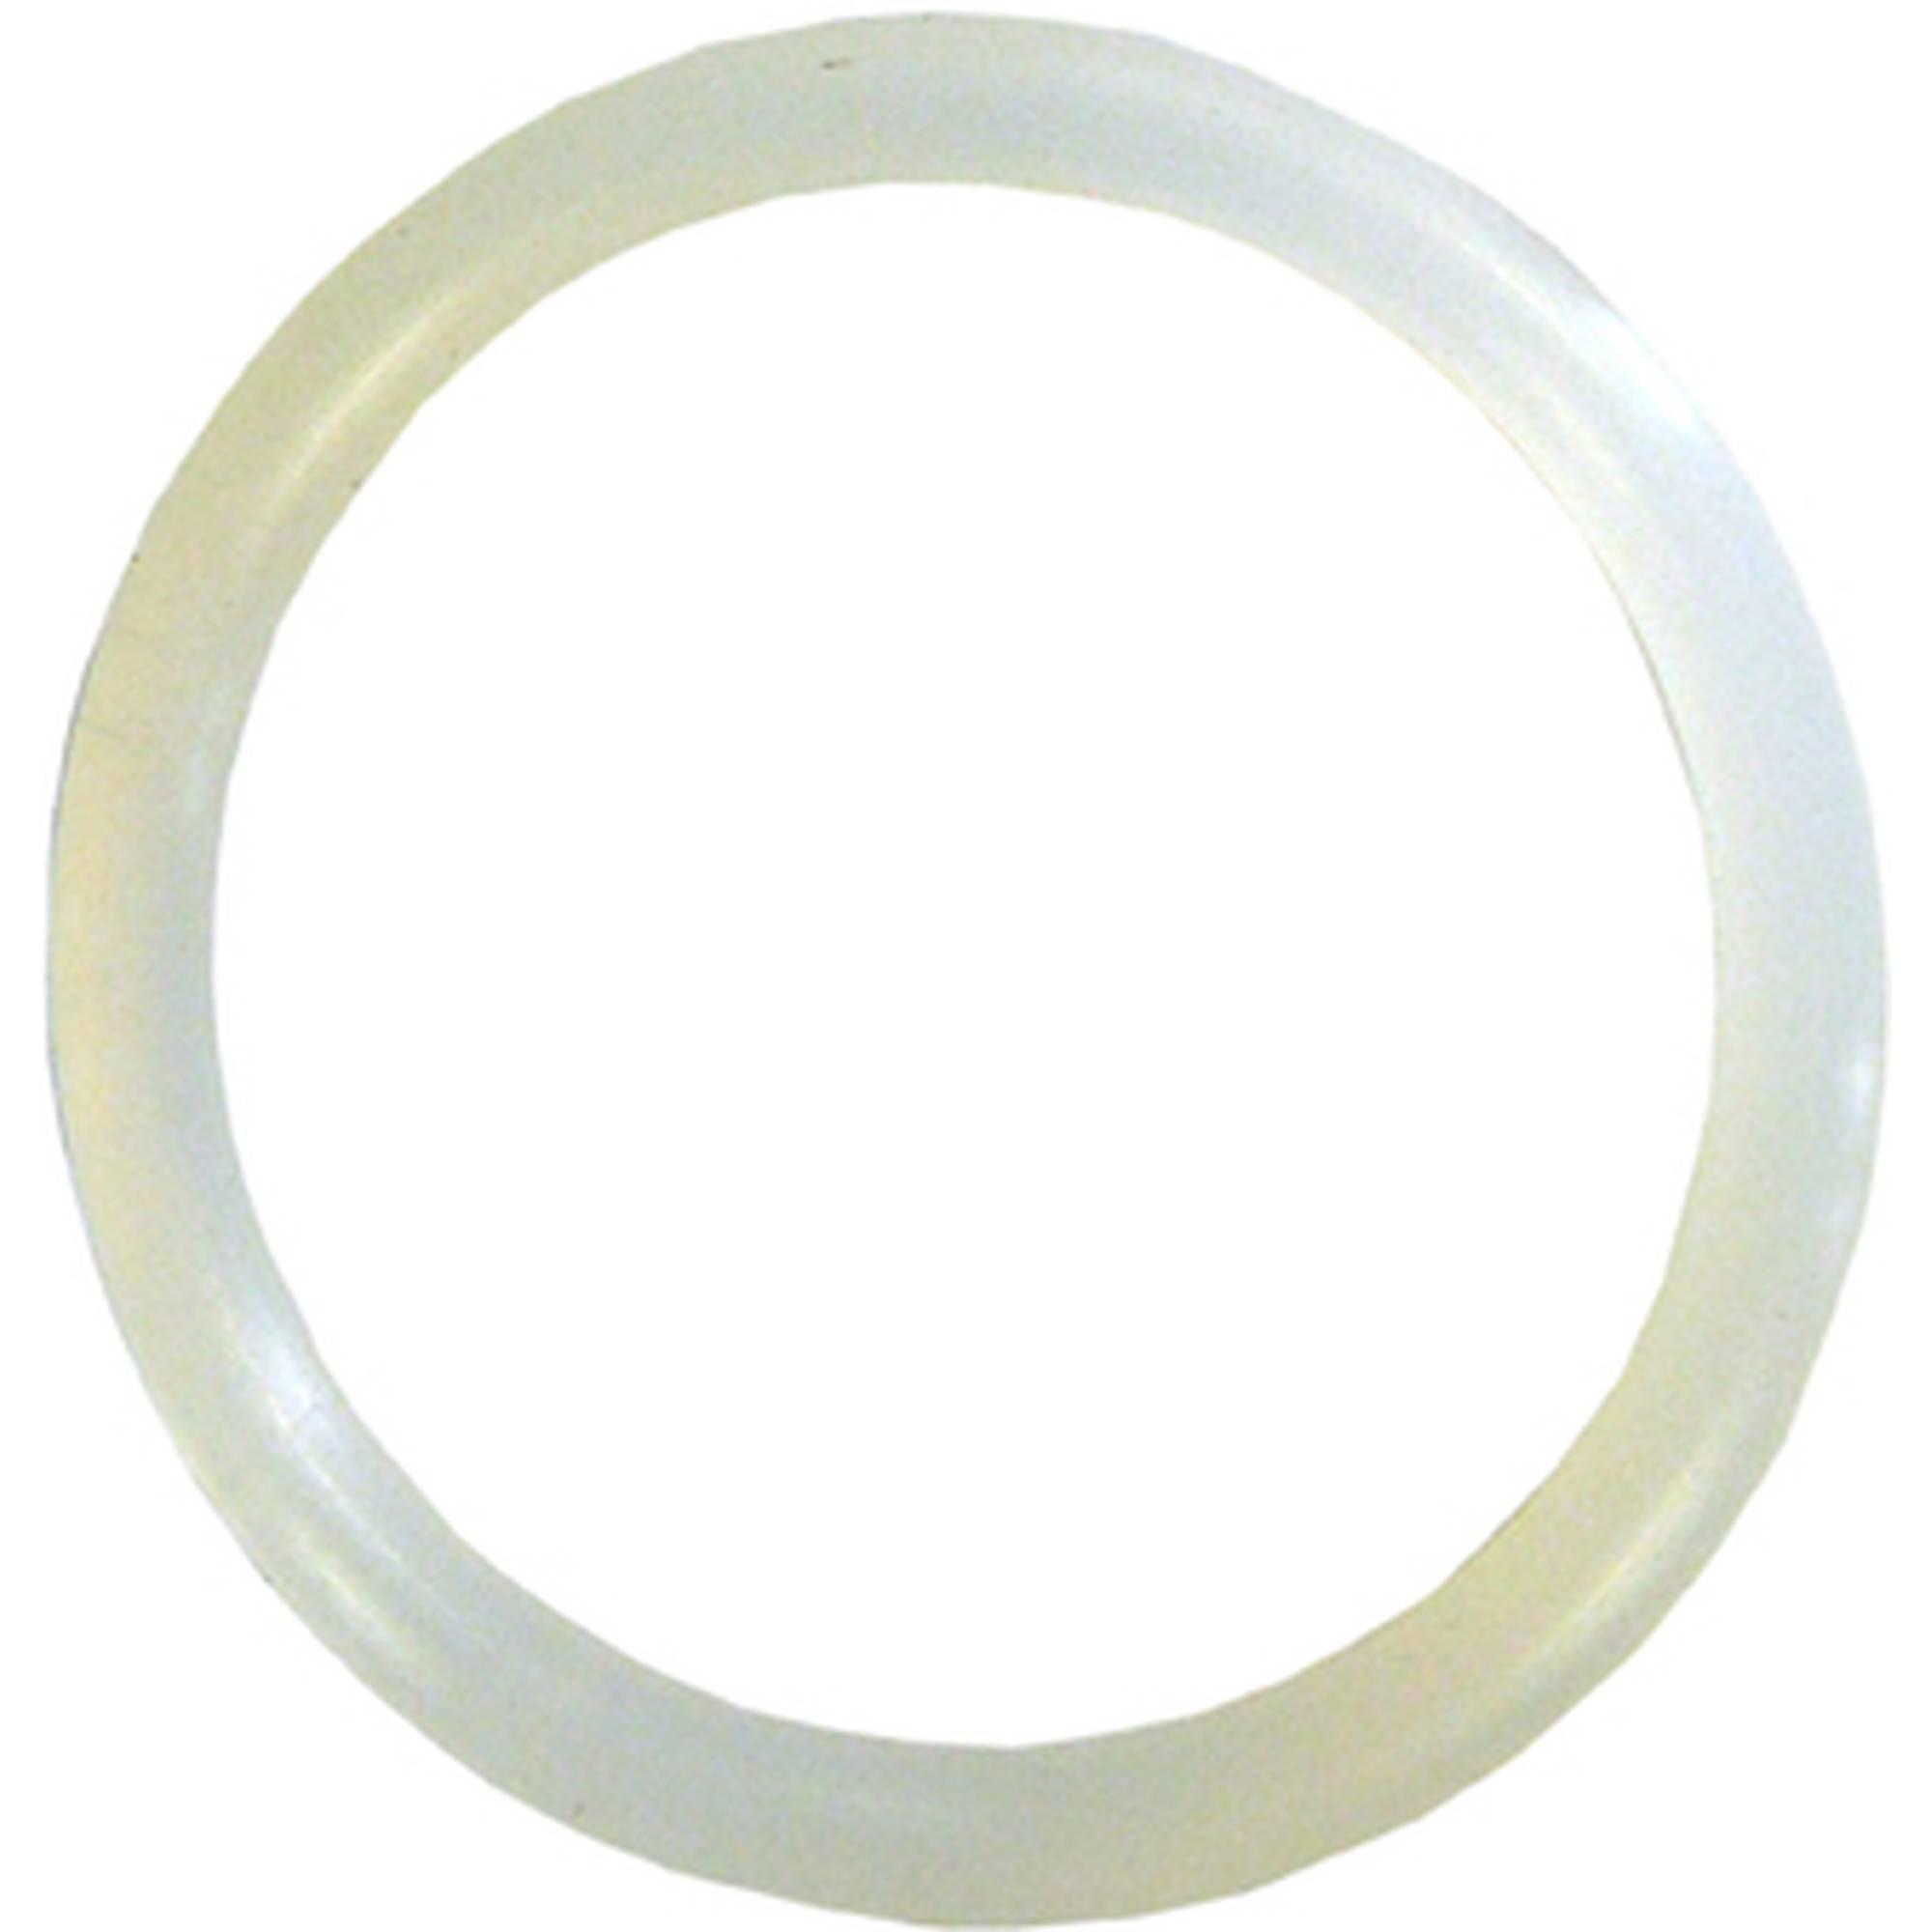 Dichtung für UV-C Lampenglass